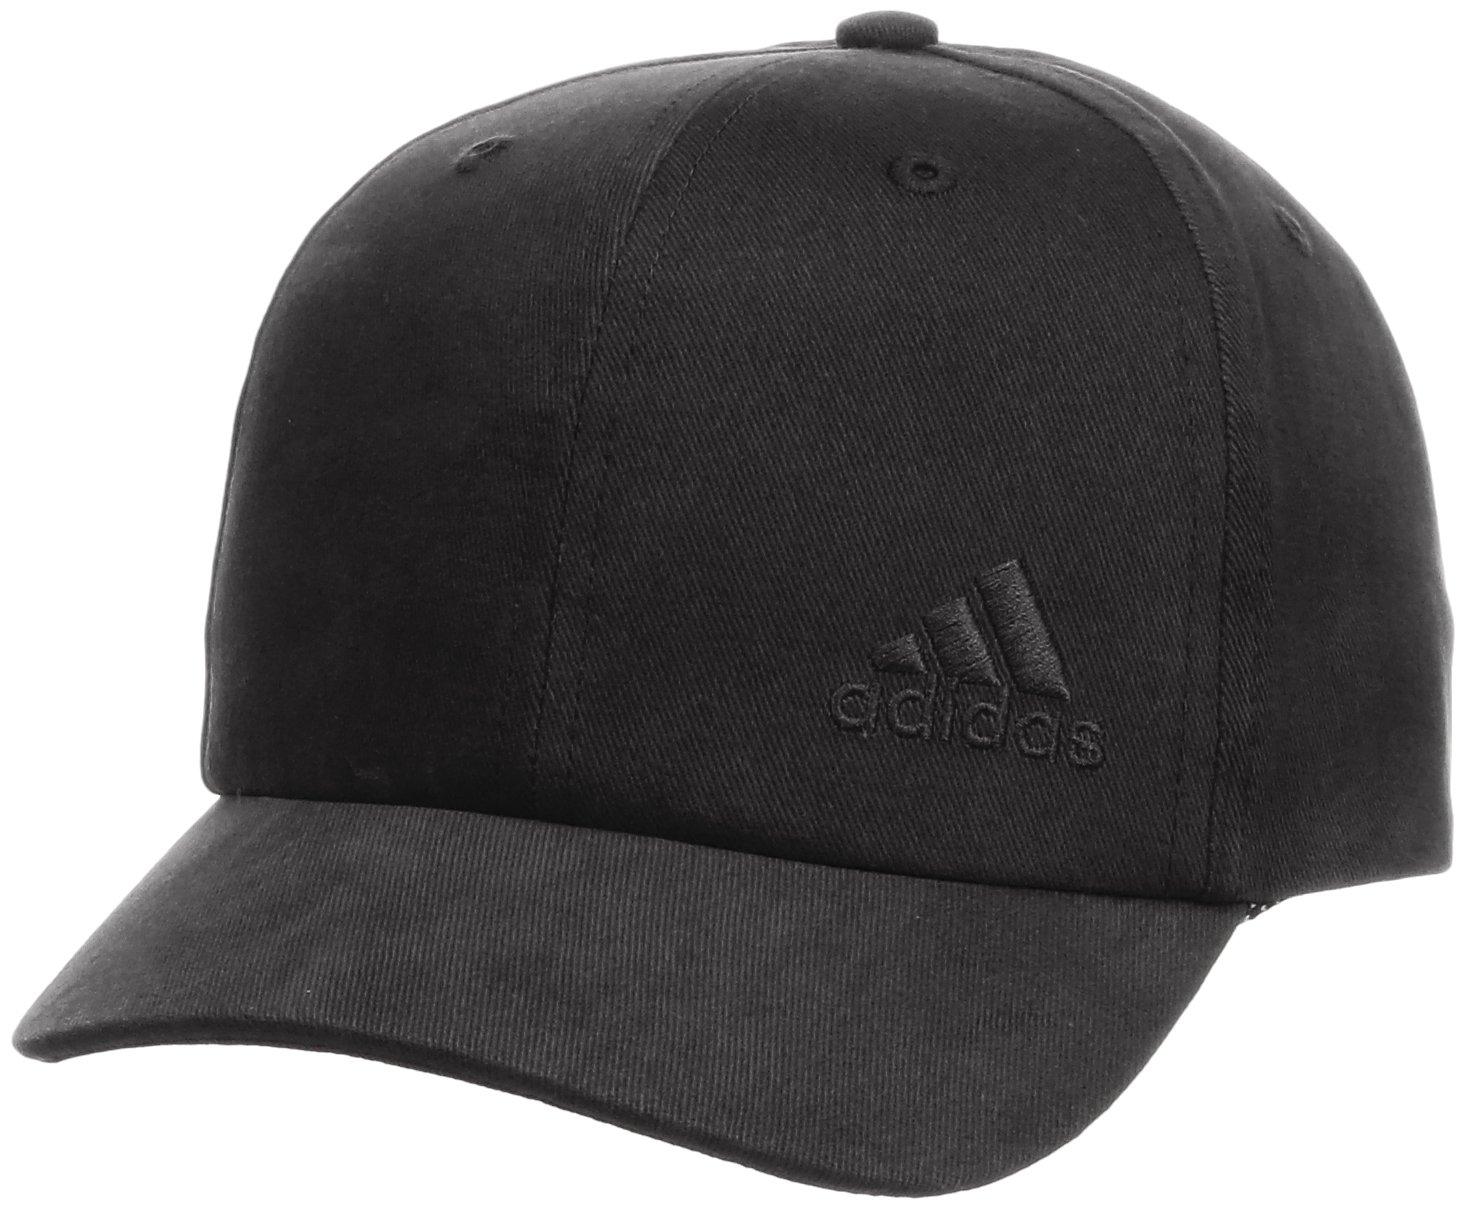 Adidas Girl's Six-Panel Cap - Black/Black/Black, One Size